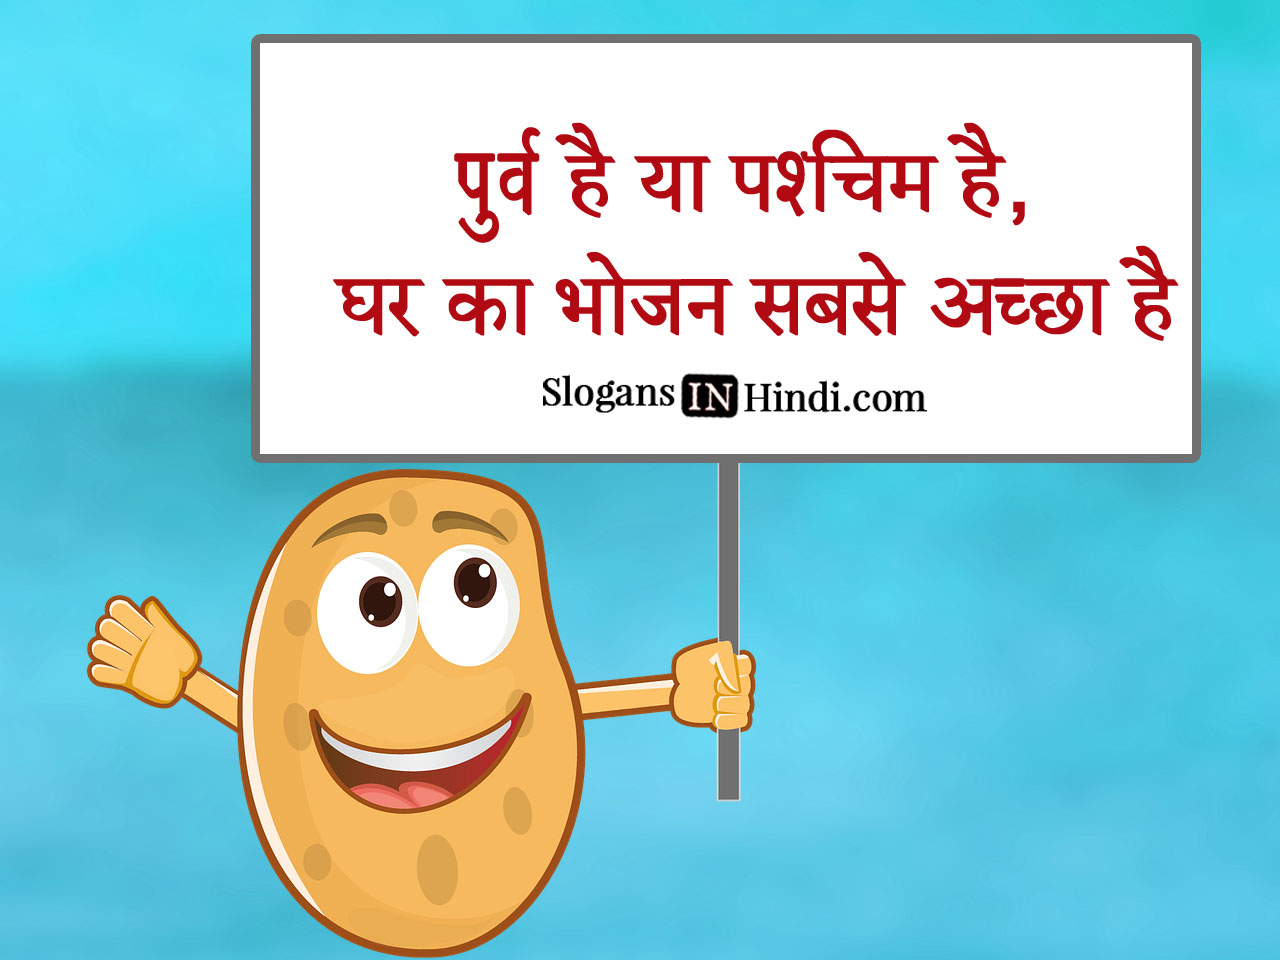 Junk Food Slogans In Hindi